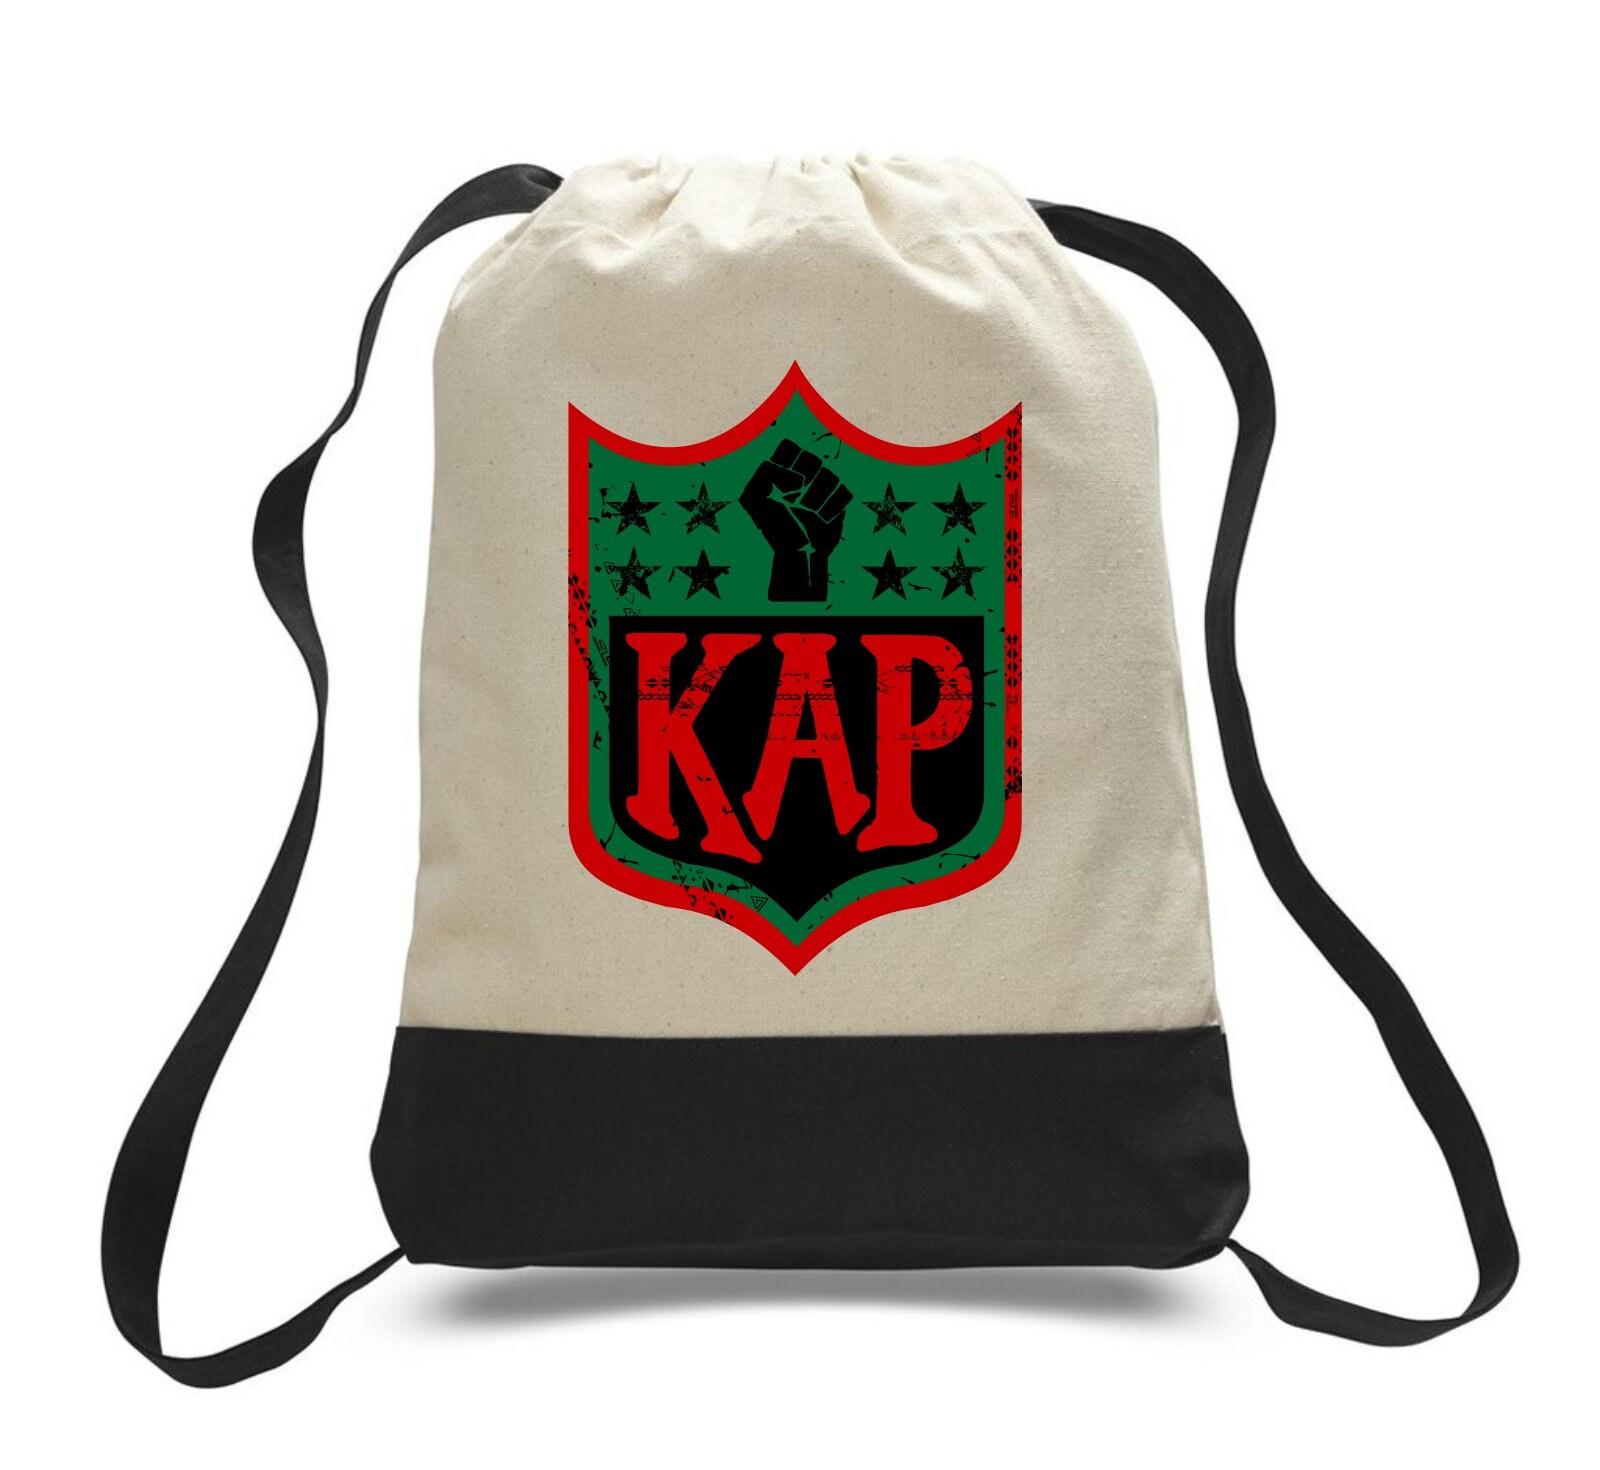 6be613c29 Colin Kaepernick Kap NFL RBG shield Inspired Backpack Tote